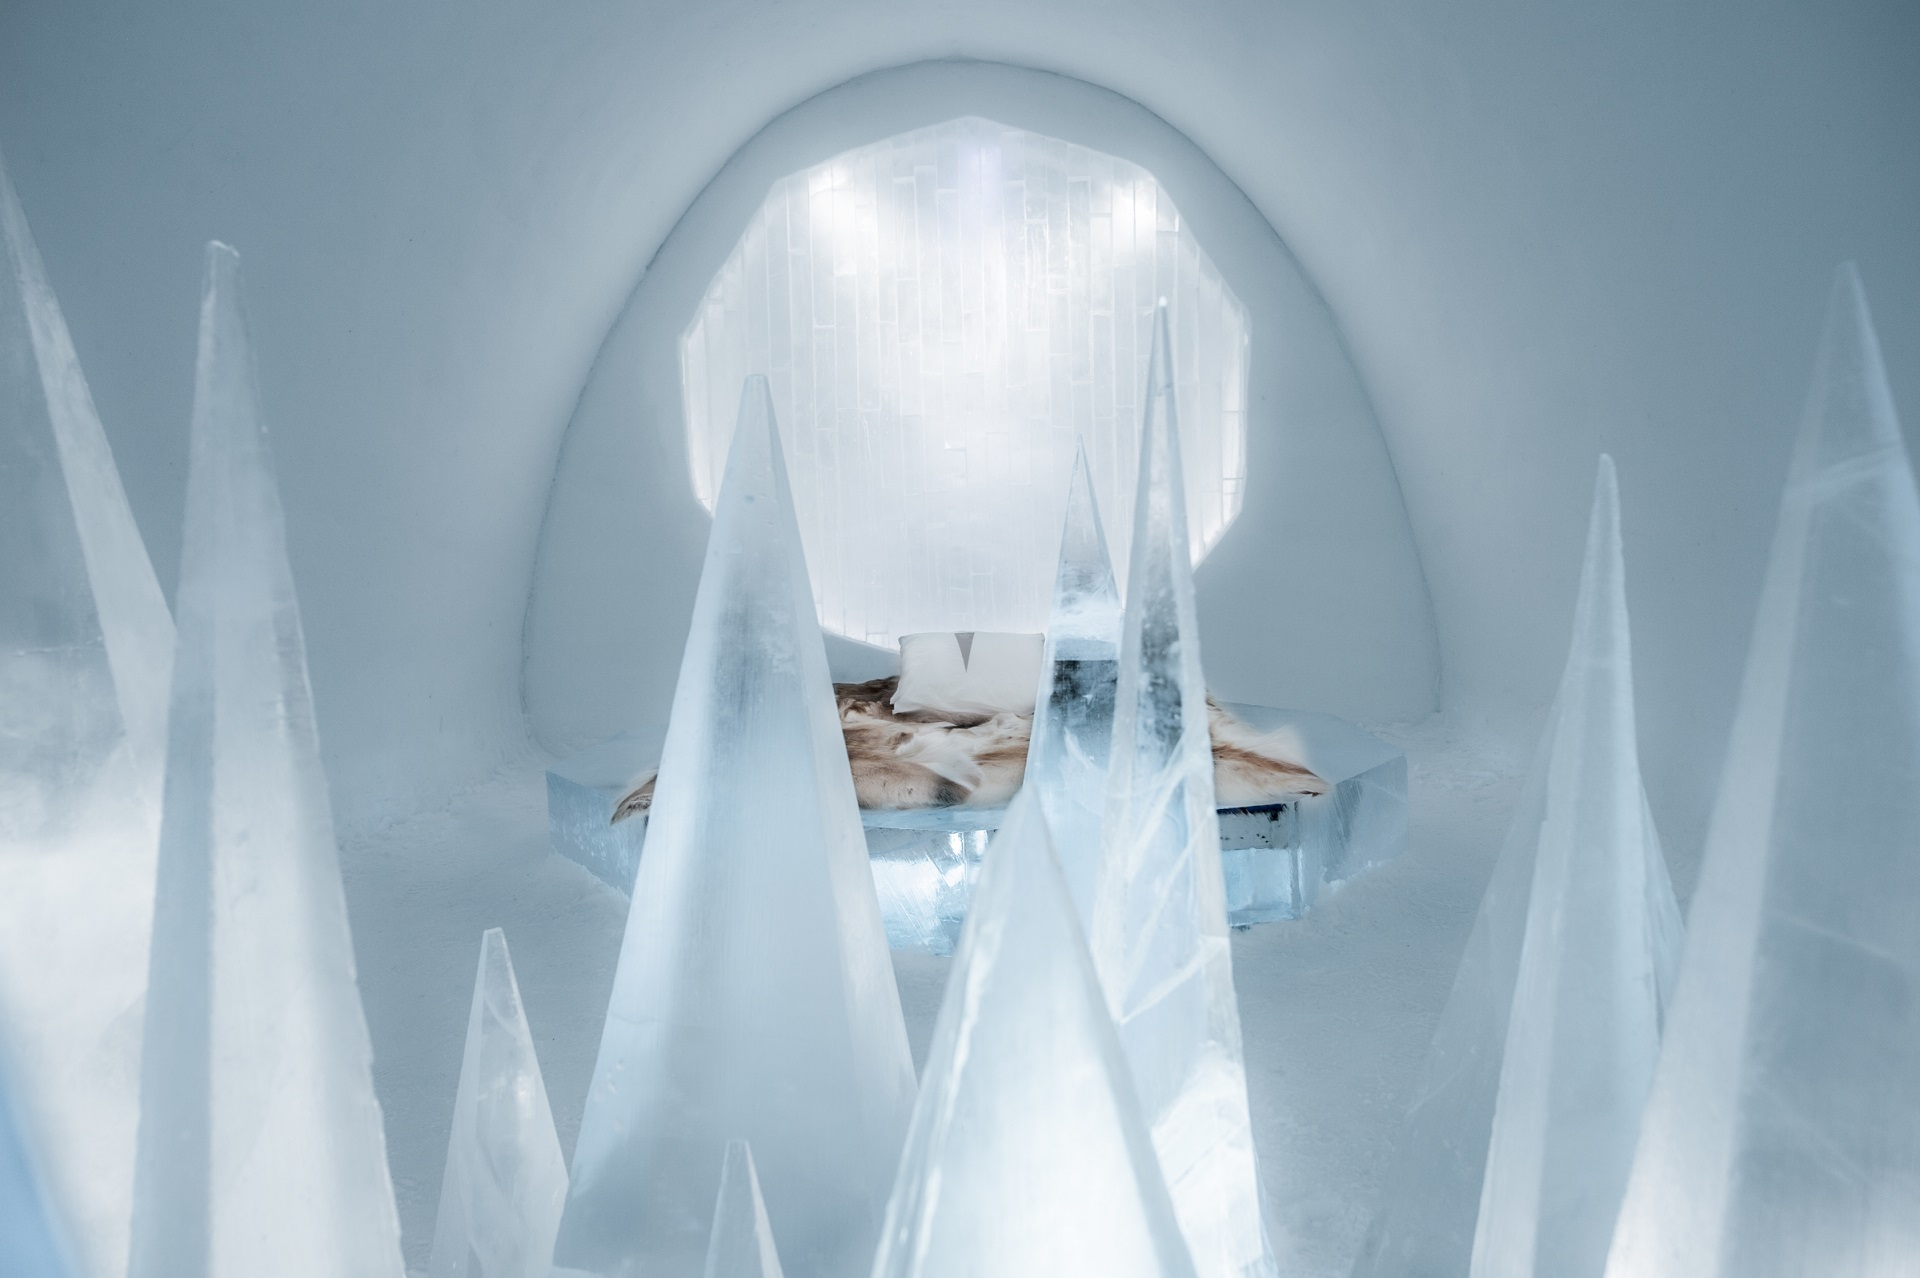 medium art suite white desert icehotel 28 Design Timsam Harding Fabián Jacquet Casado. Photo Asaf Kliger. 2